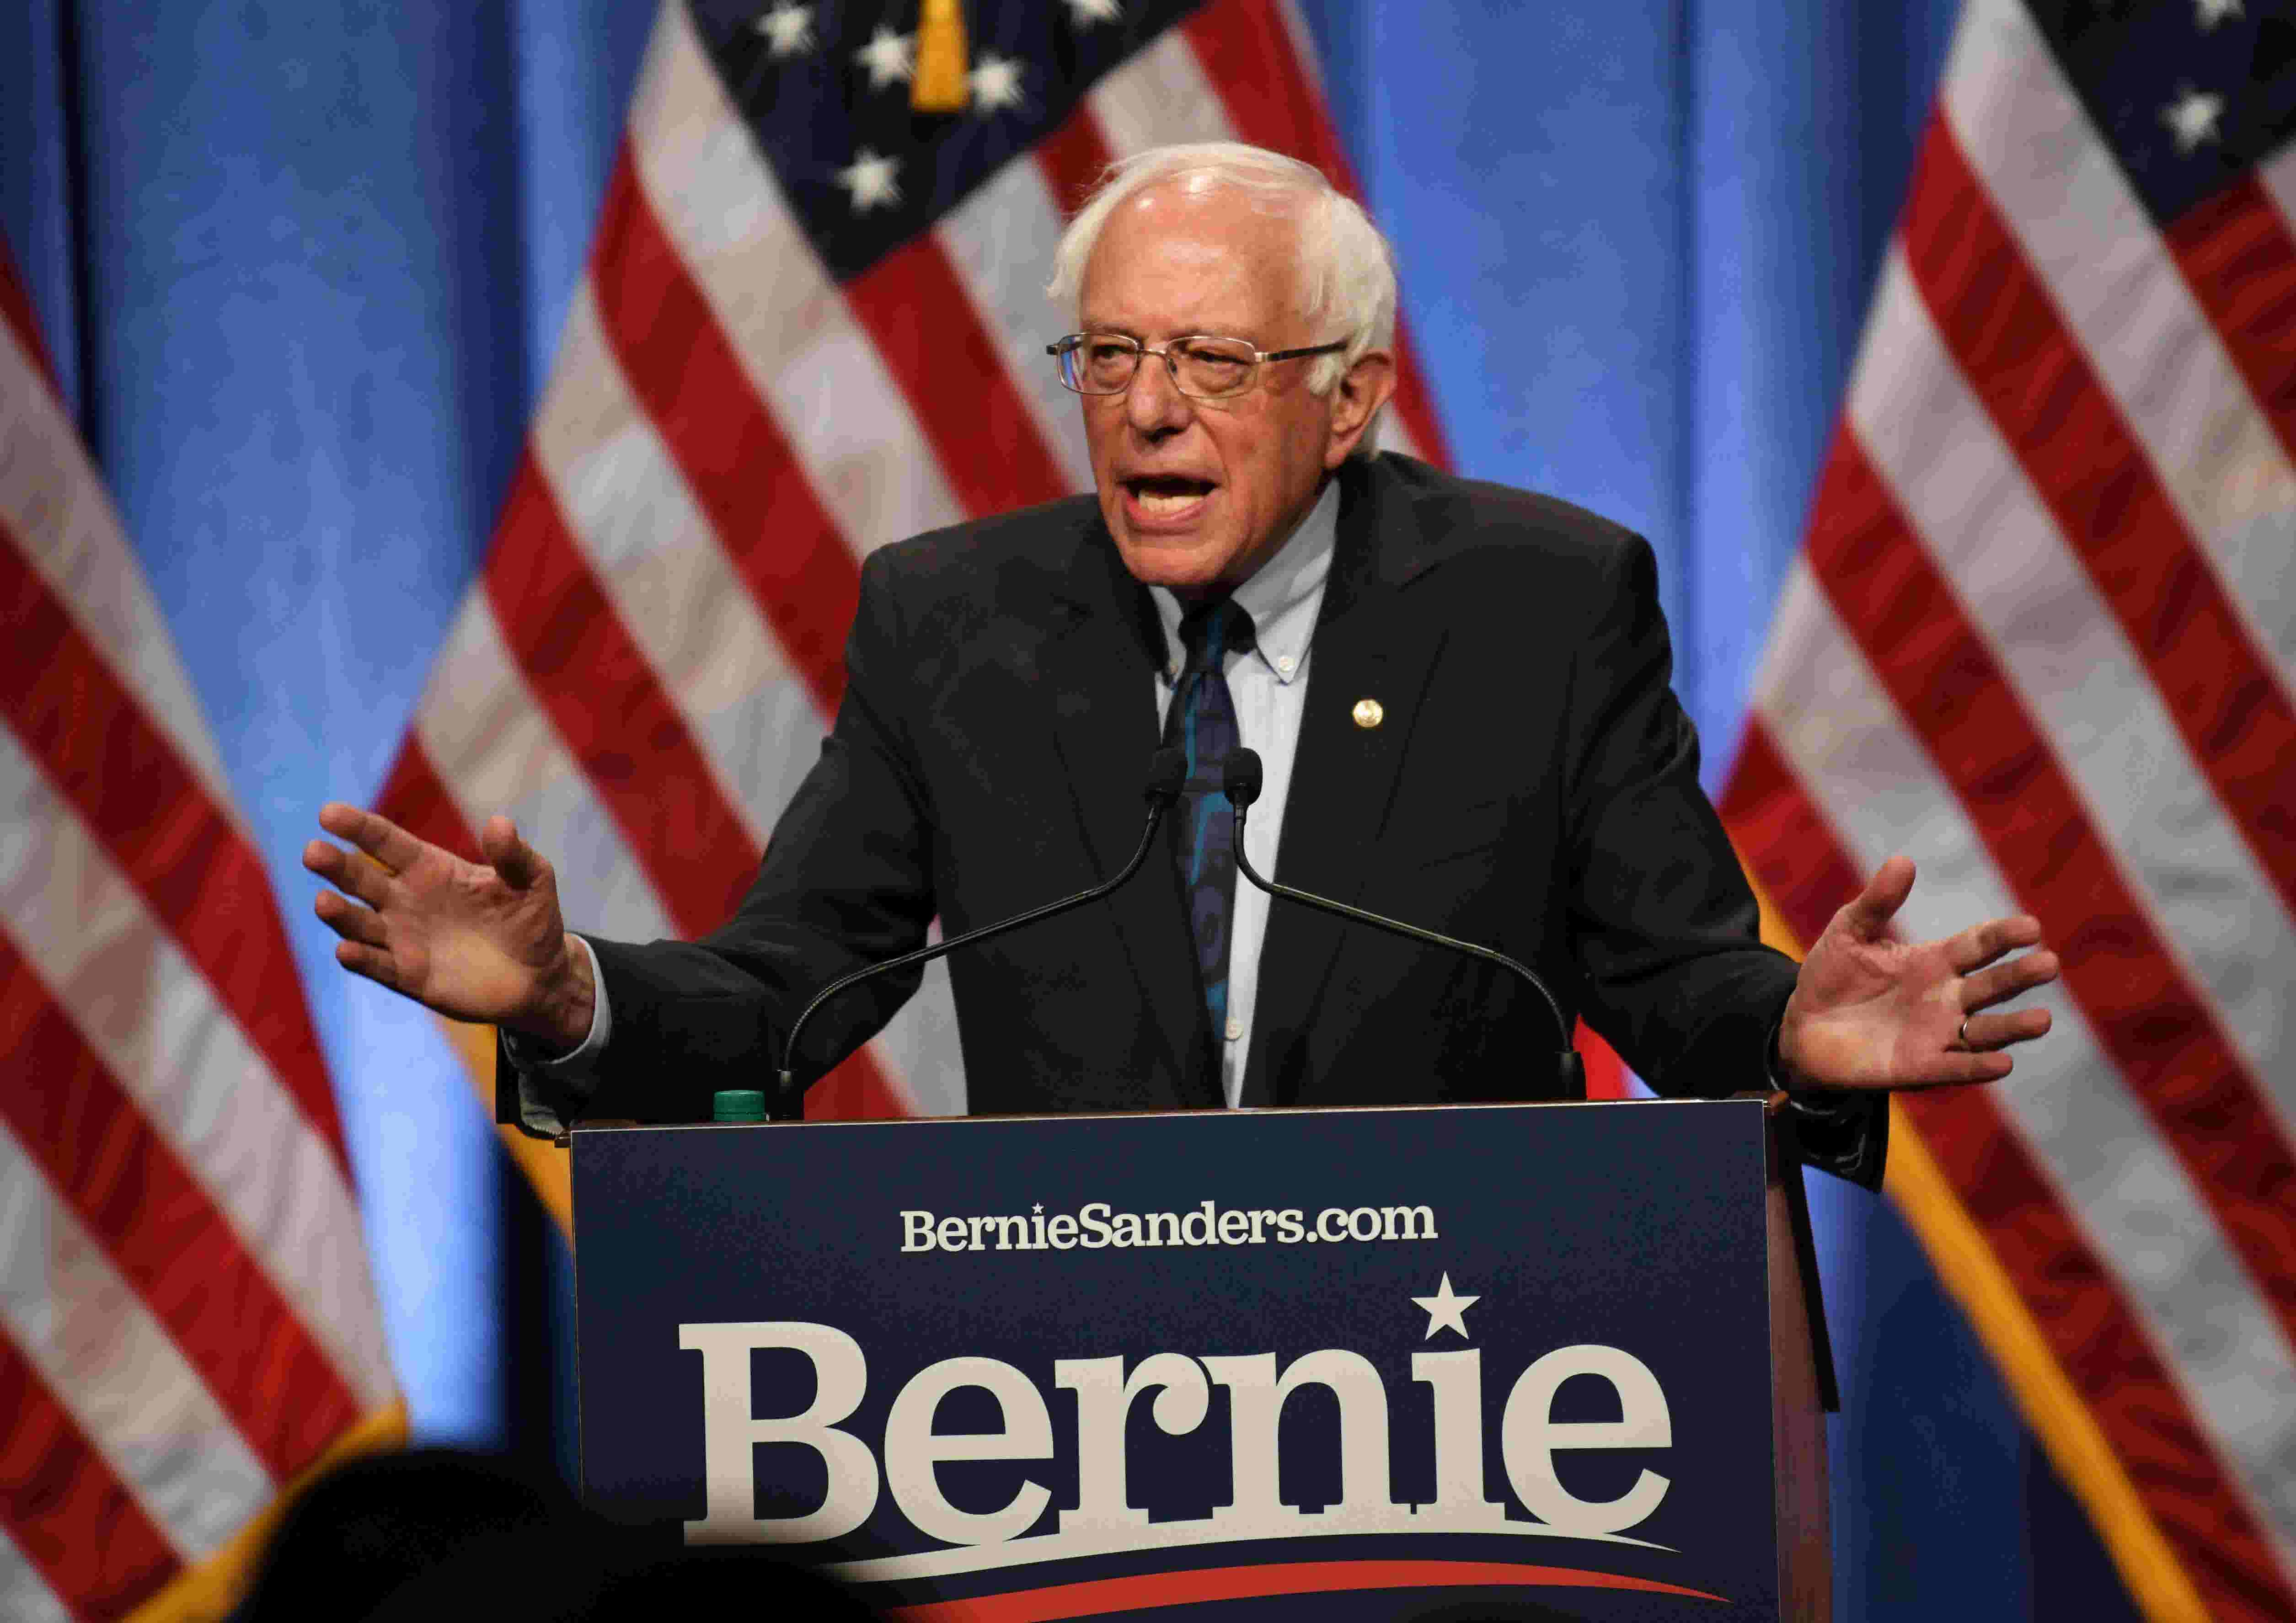 Presidential hopeful Bernie Sanders to visit Louisville on Sunday for rally